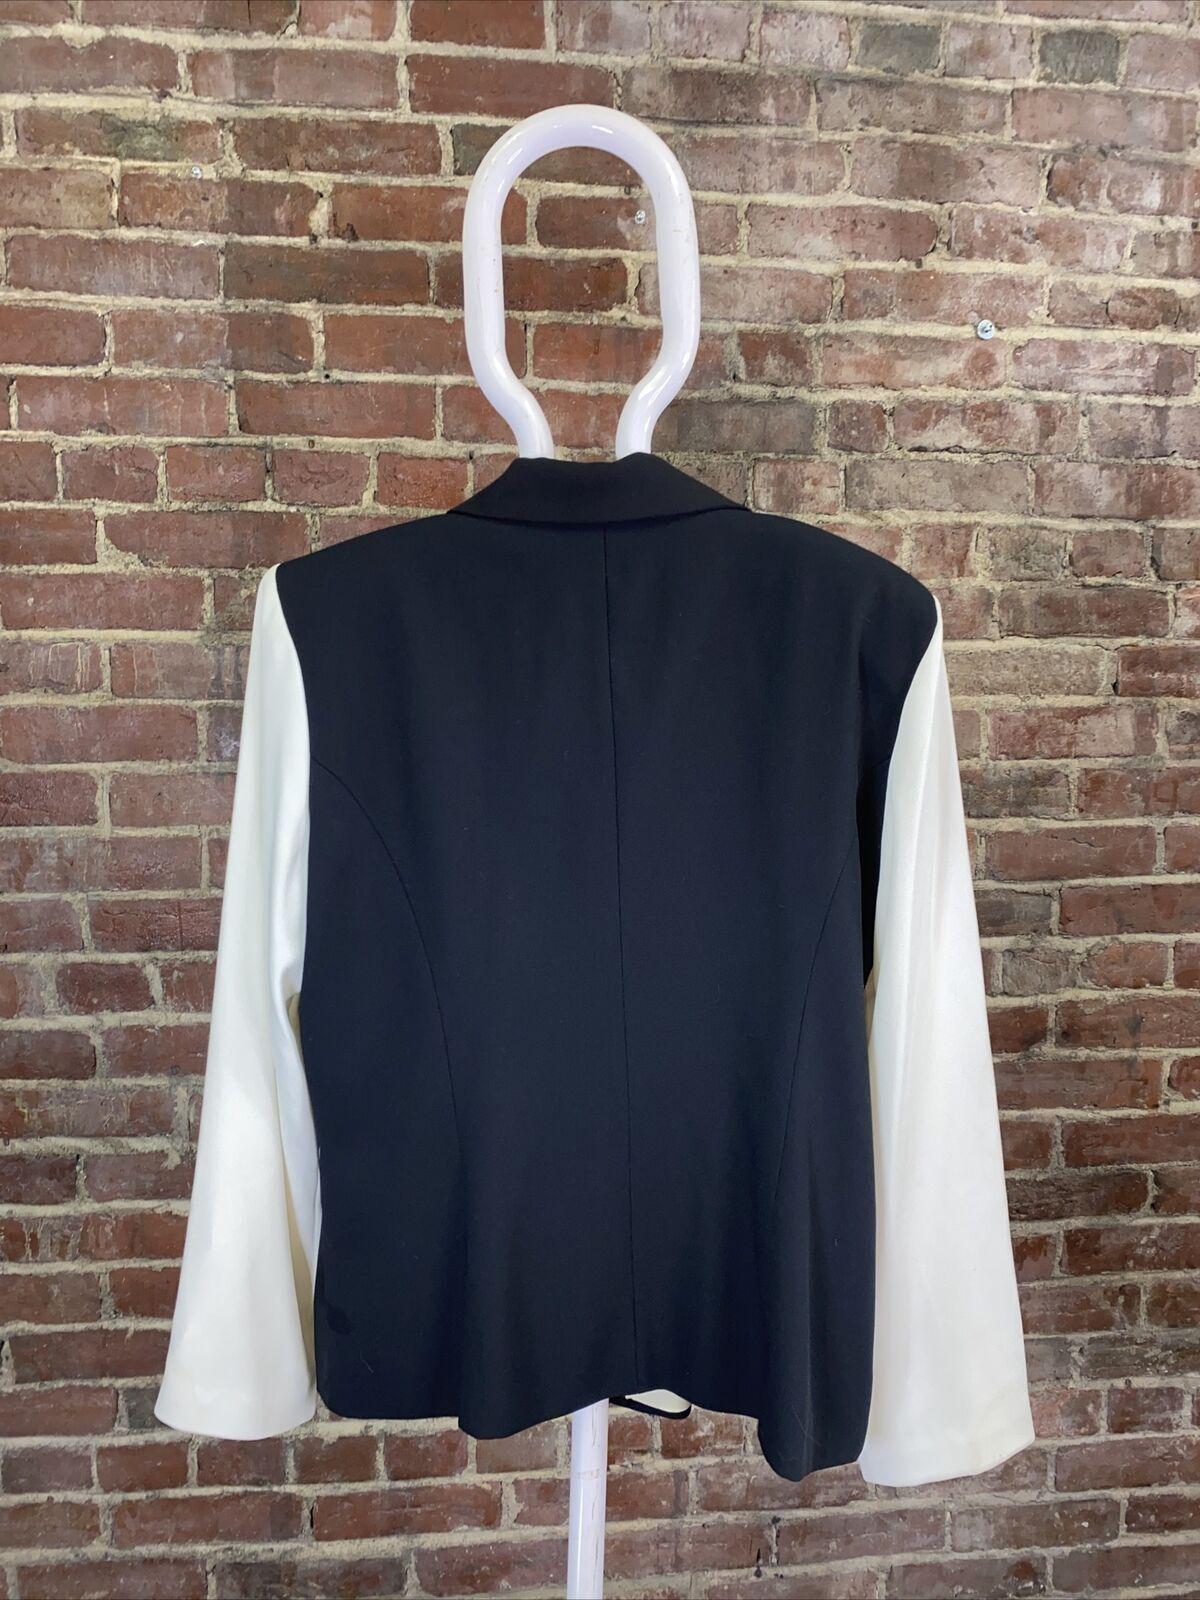 Claire McCardell vintage jacket circa 1950s Rocka… - image 10